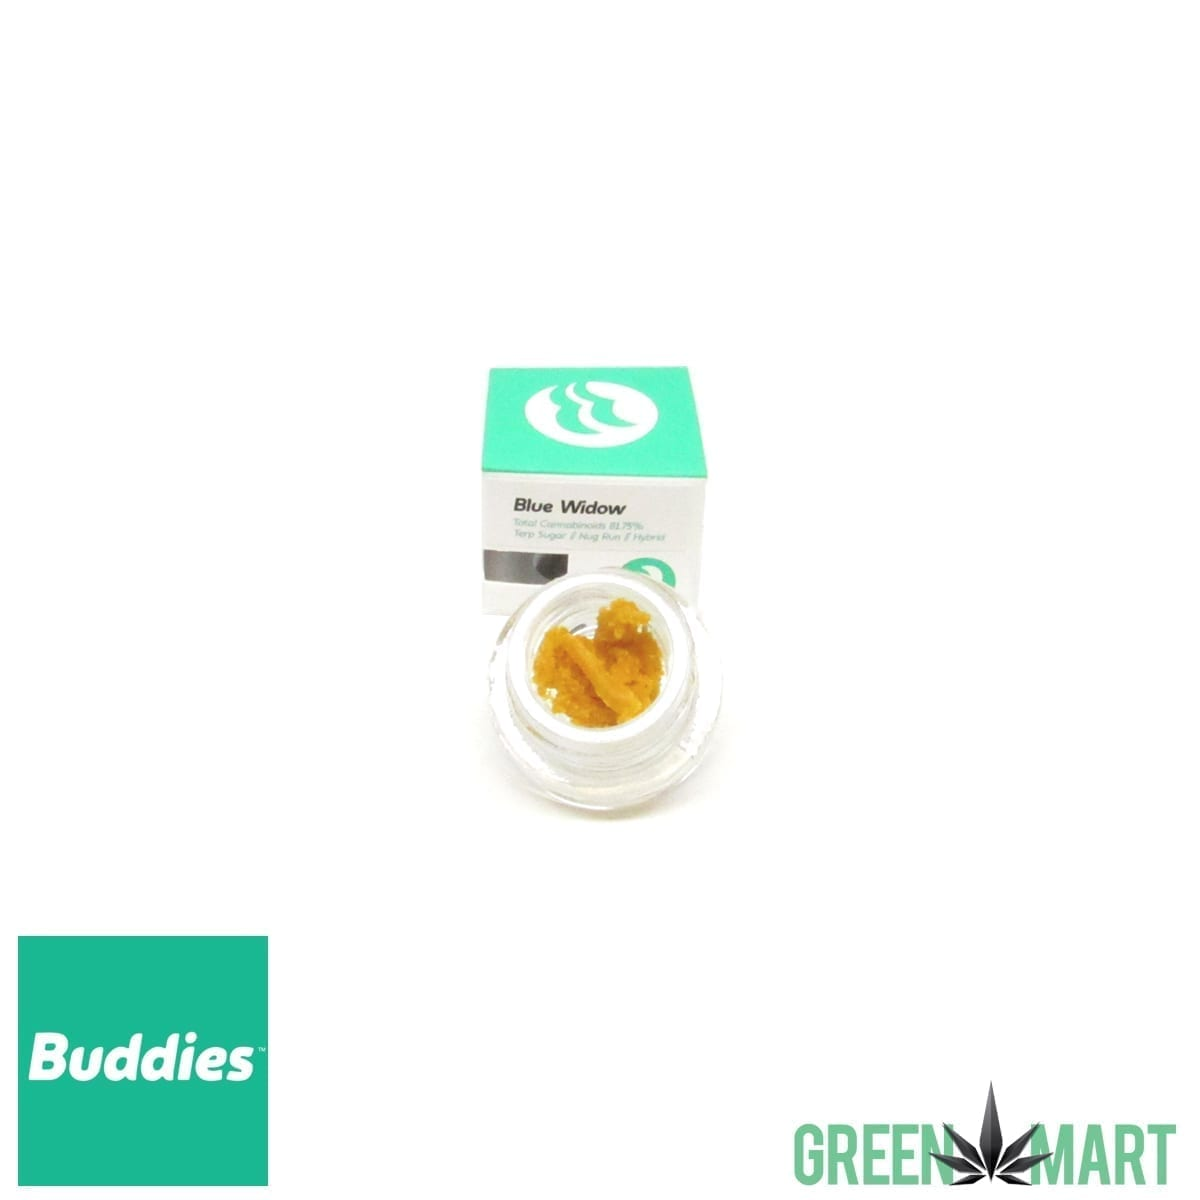 Buddies Brand Terp Sugar - Blue Widow